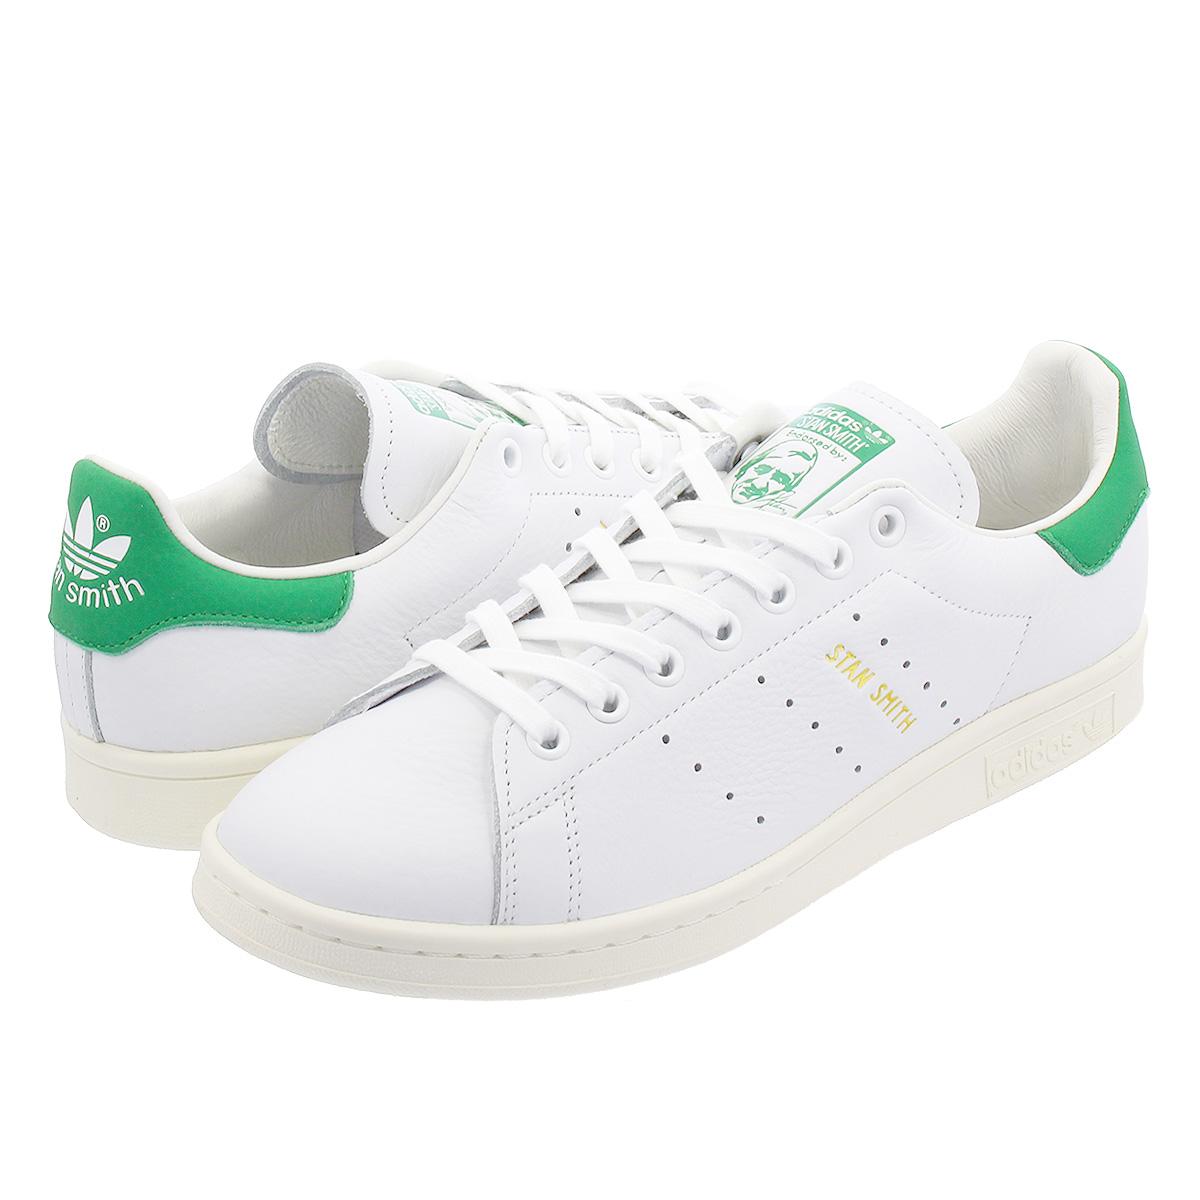 566fffaf7496 adidas STAN SMITH Adidas Stan Smith RUNNING WHITE RUNNING WHITE GREEN ef7508